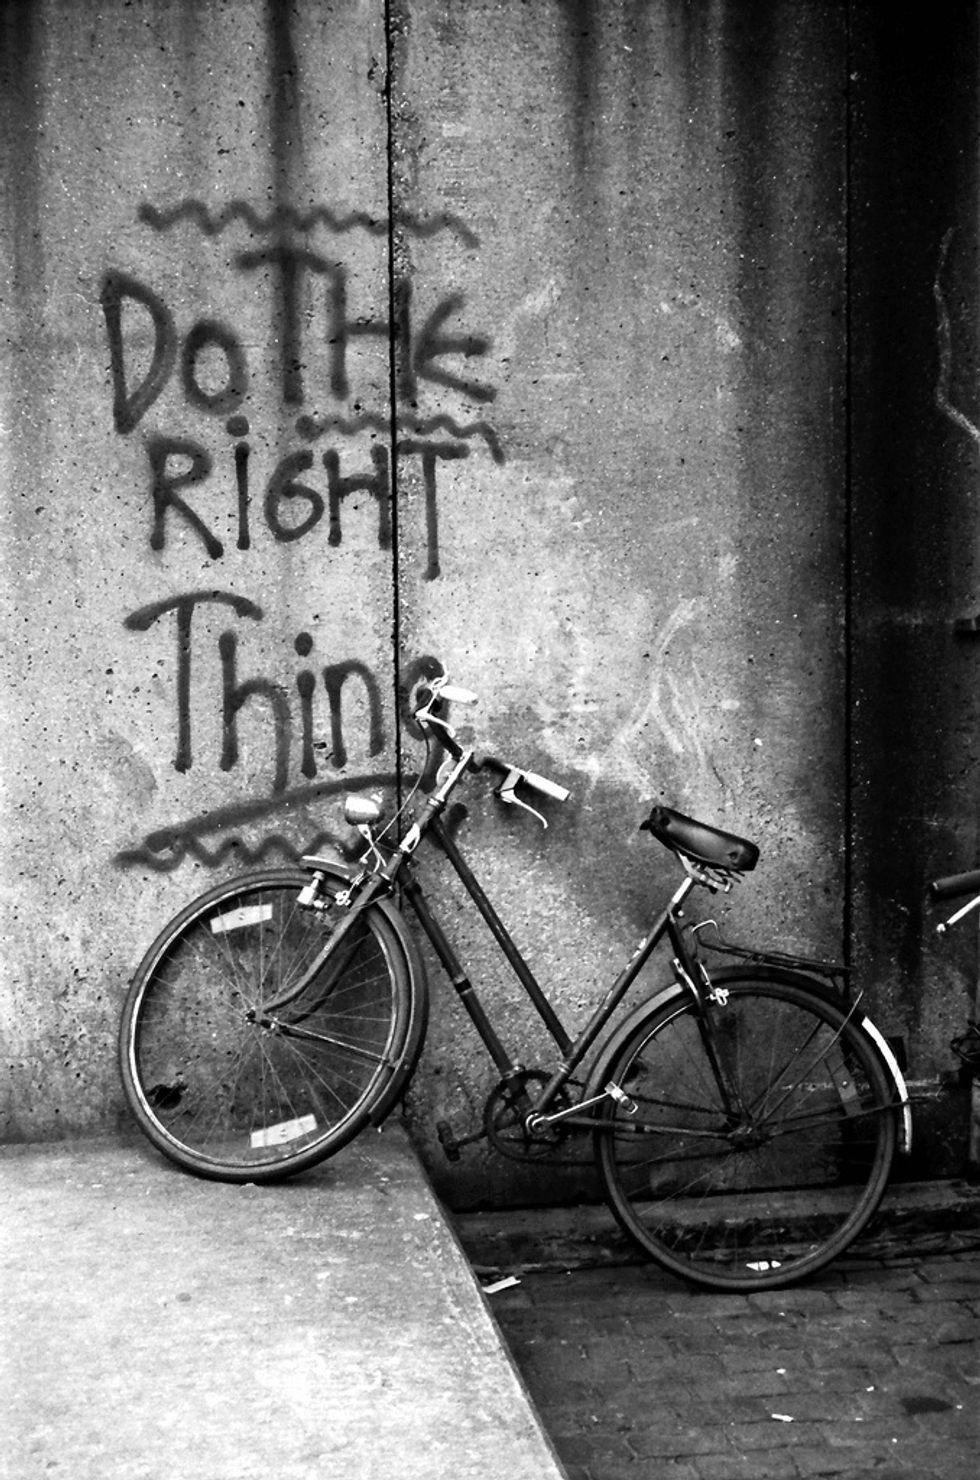 https://upload.wikimedia.org/wikipedia/commons/0/09/Do_The_Right_Thing_graffiti_Amsterdam.jpg